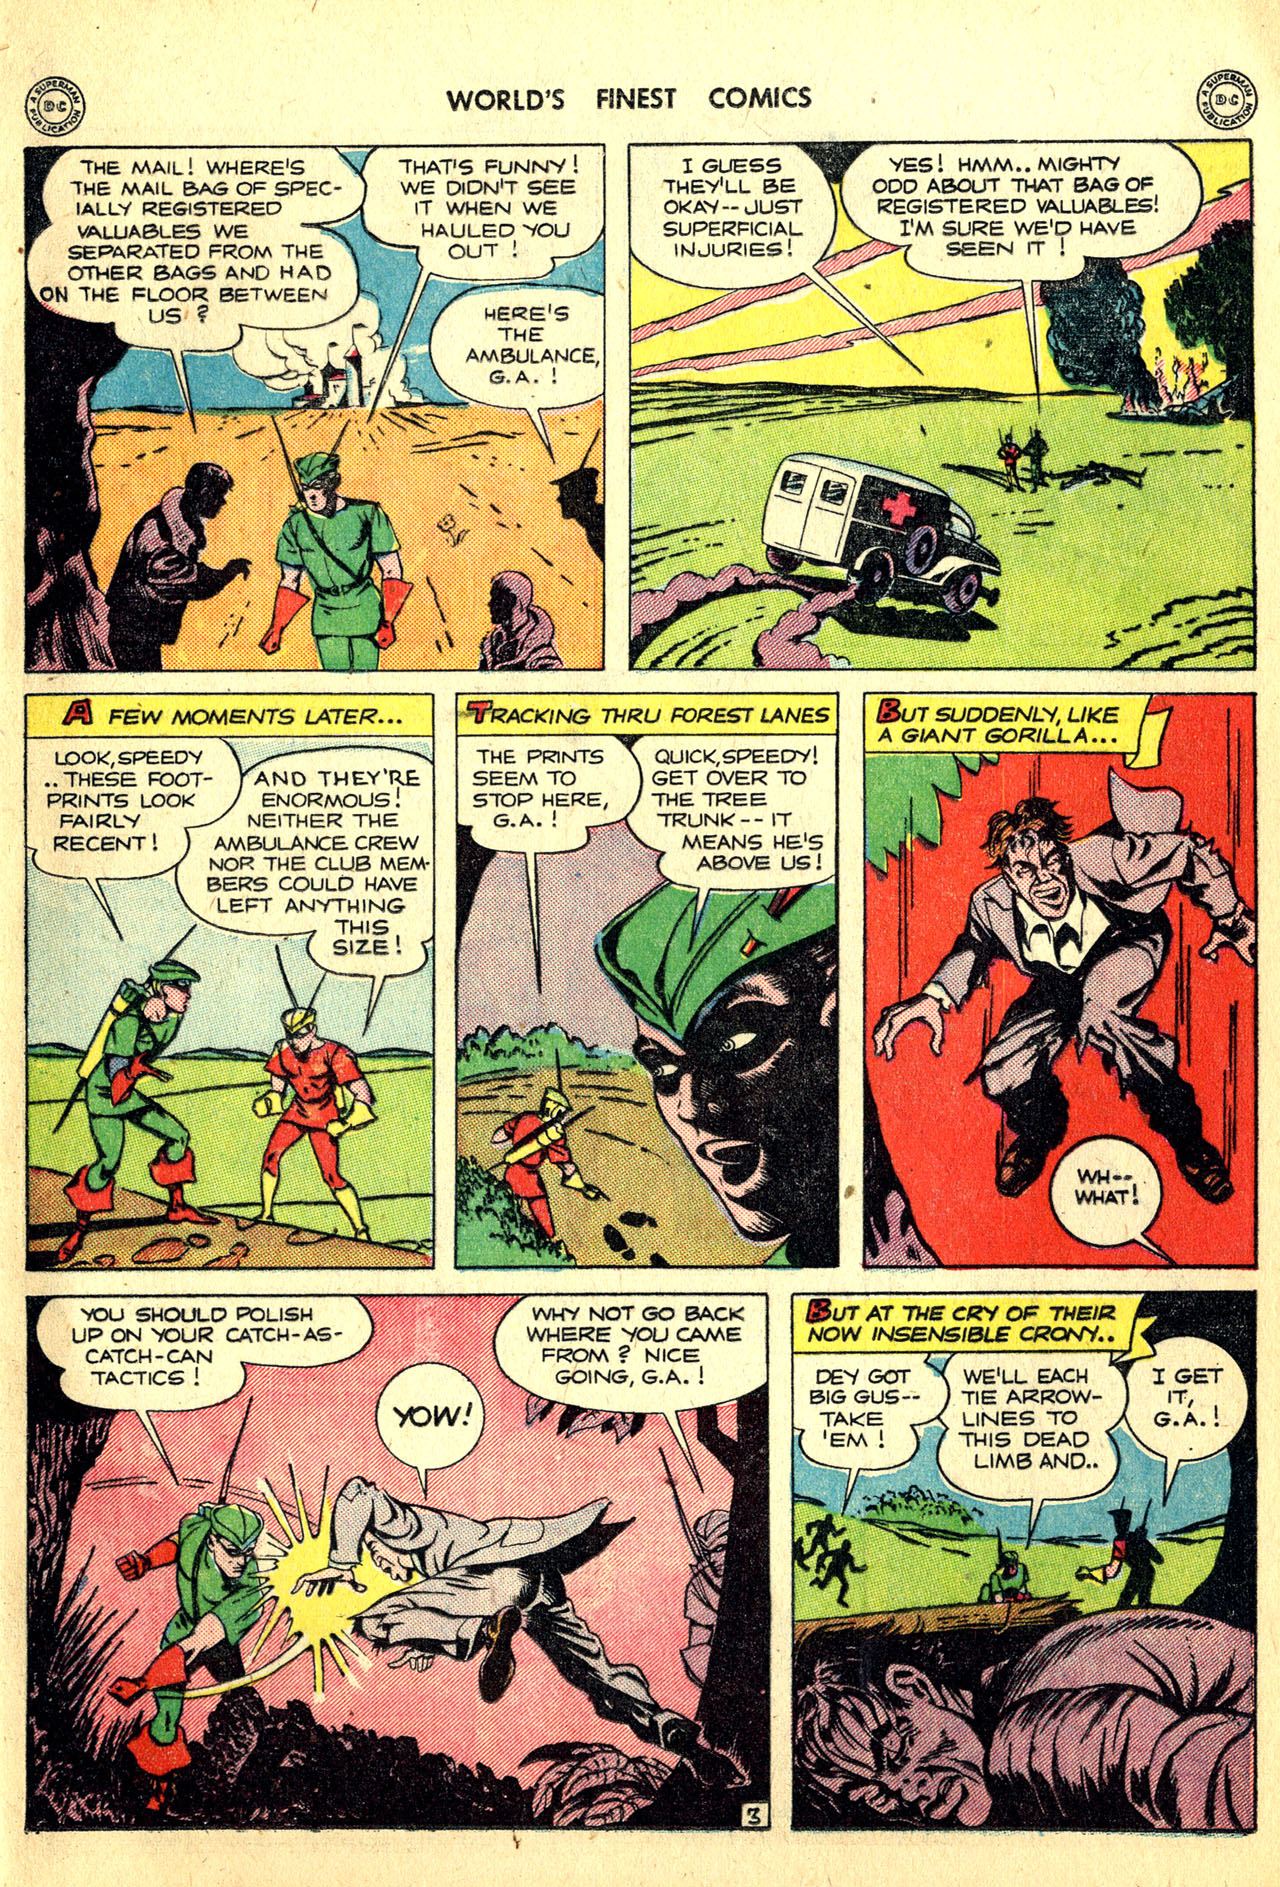 Read online World's Finest Comics comic -  Issue #18 - 51